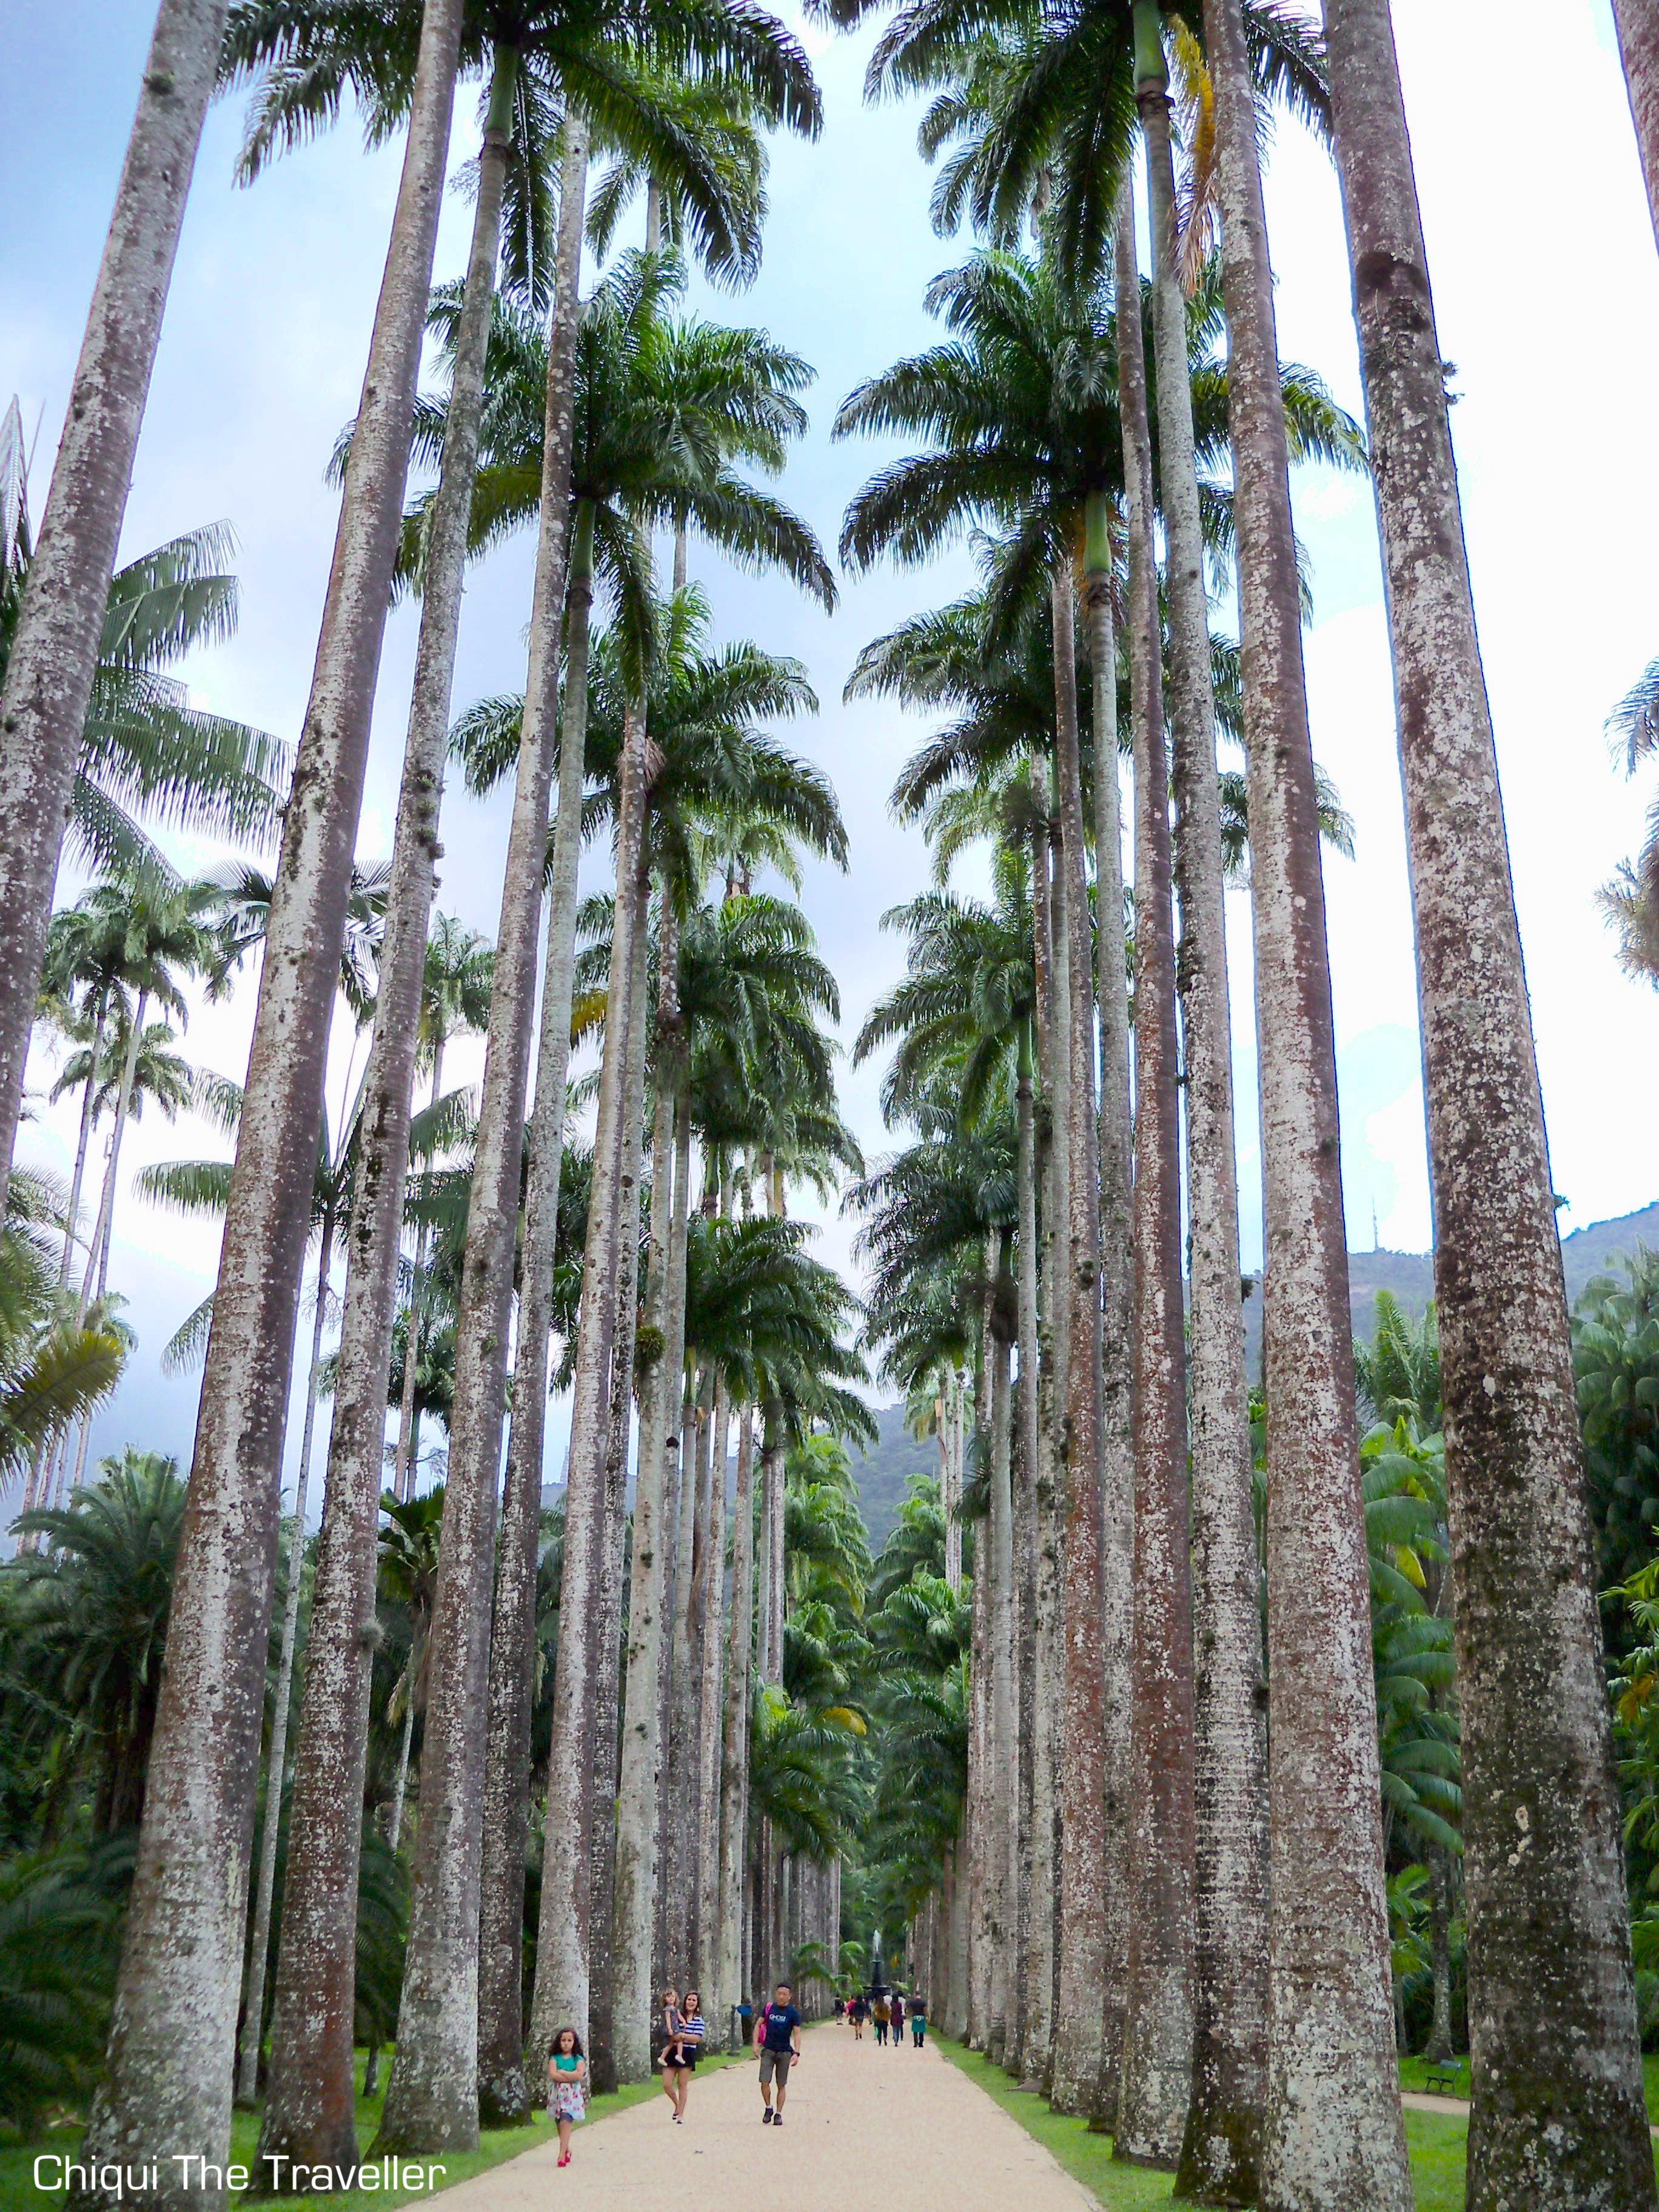 Paseo imperial palmeras Rio de Janeiro